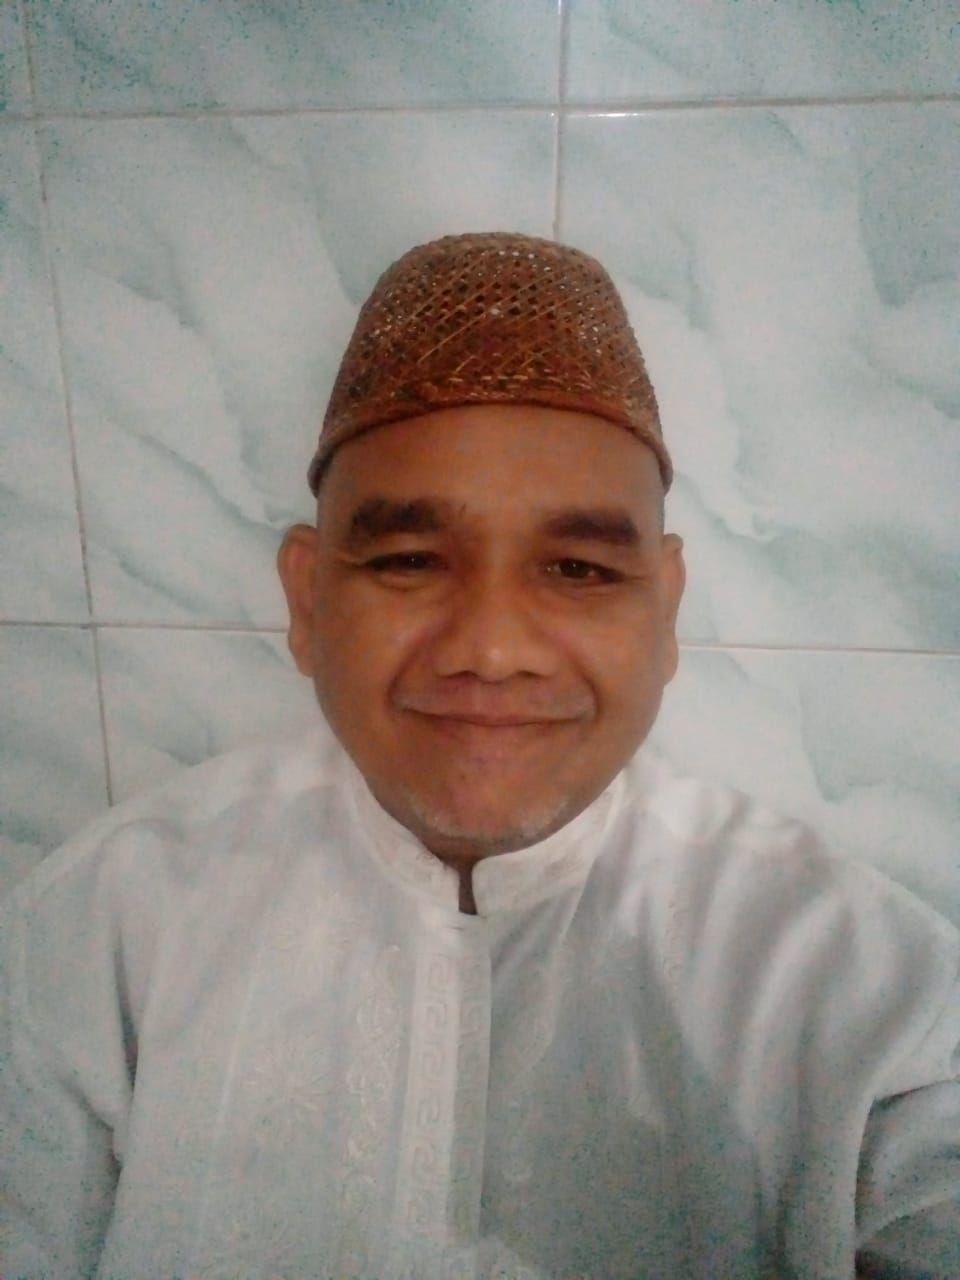 omjay di masjid al islam Bandung (dokpri)